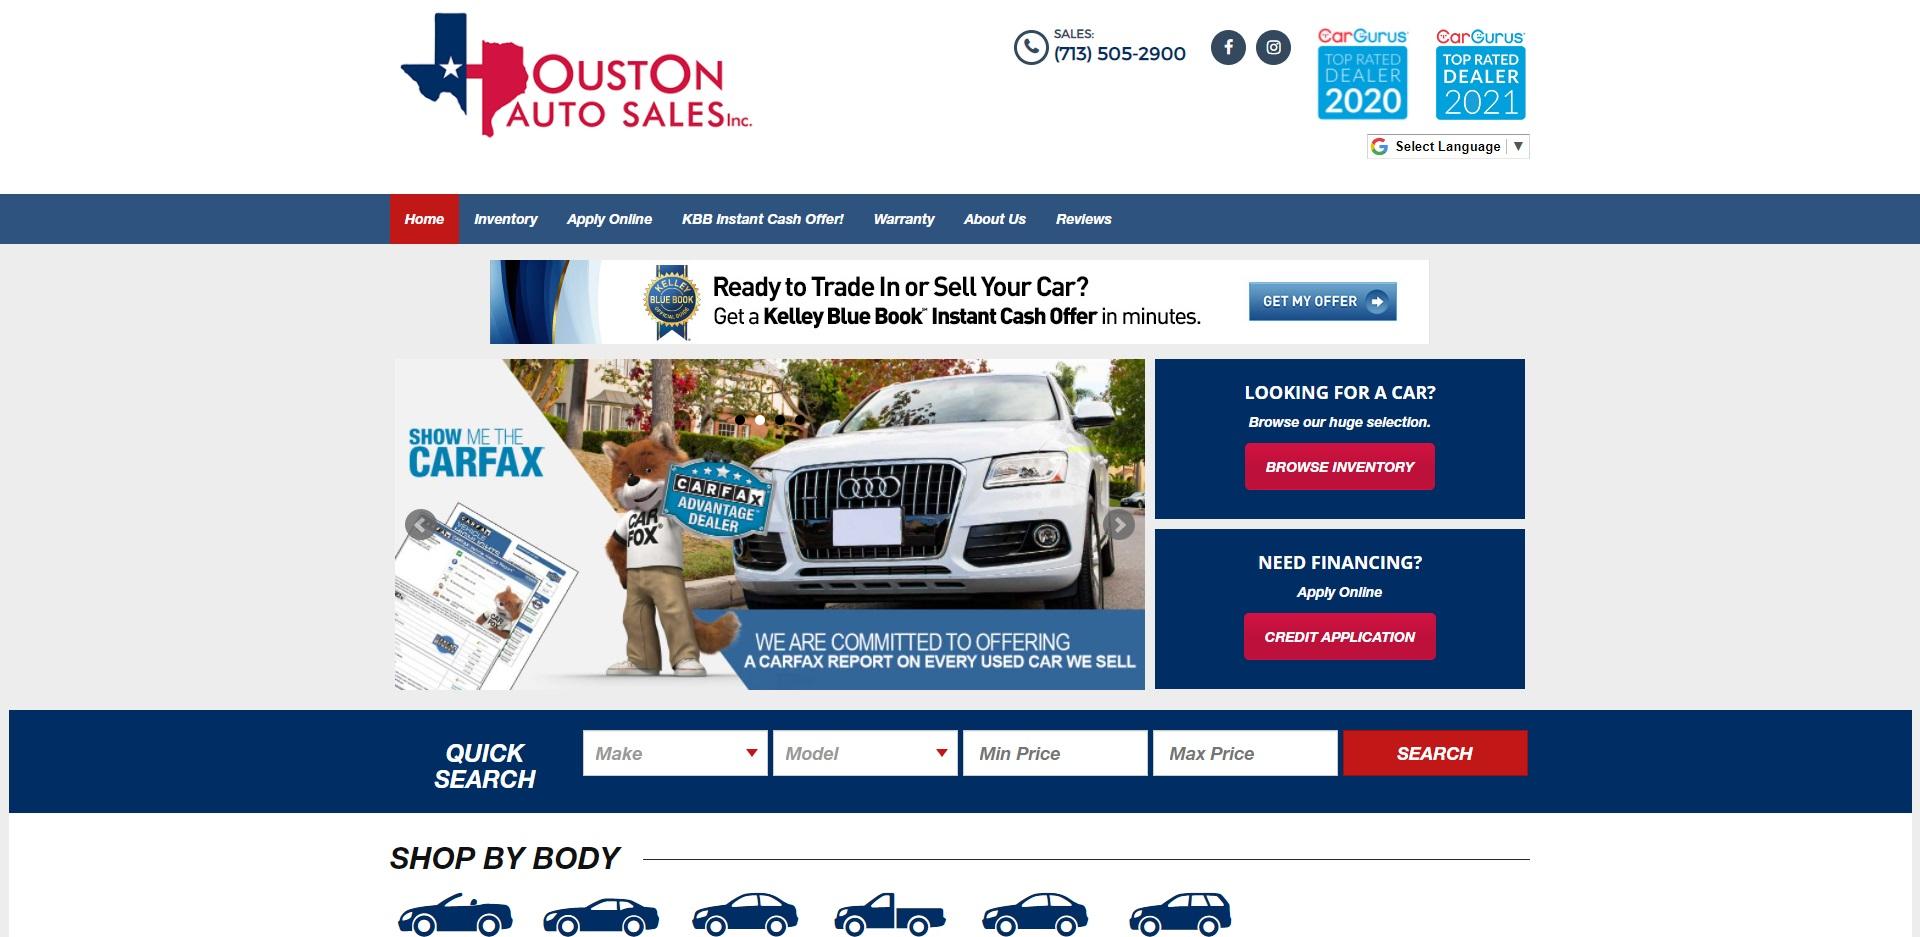 The Best Car Dealerships in Houston